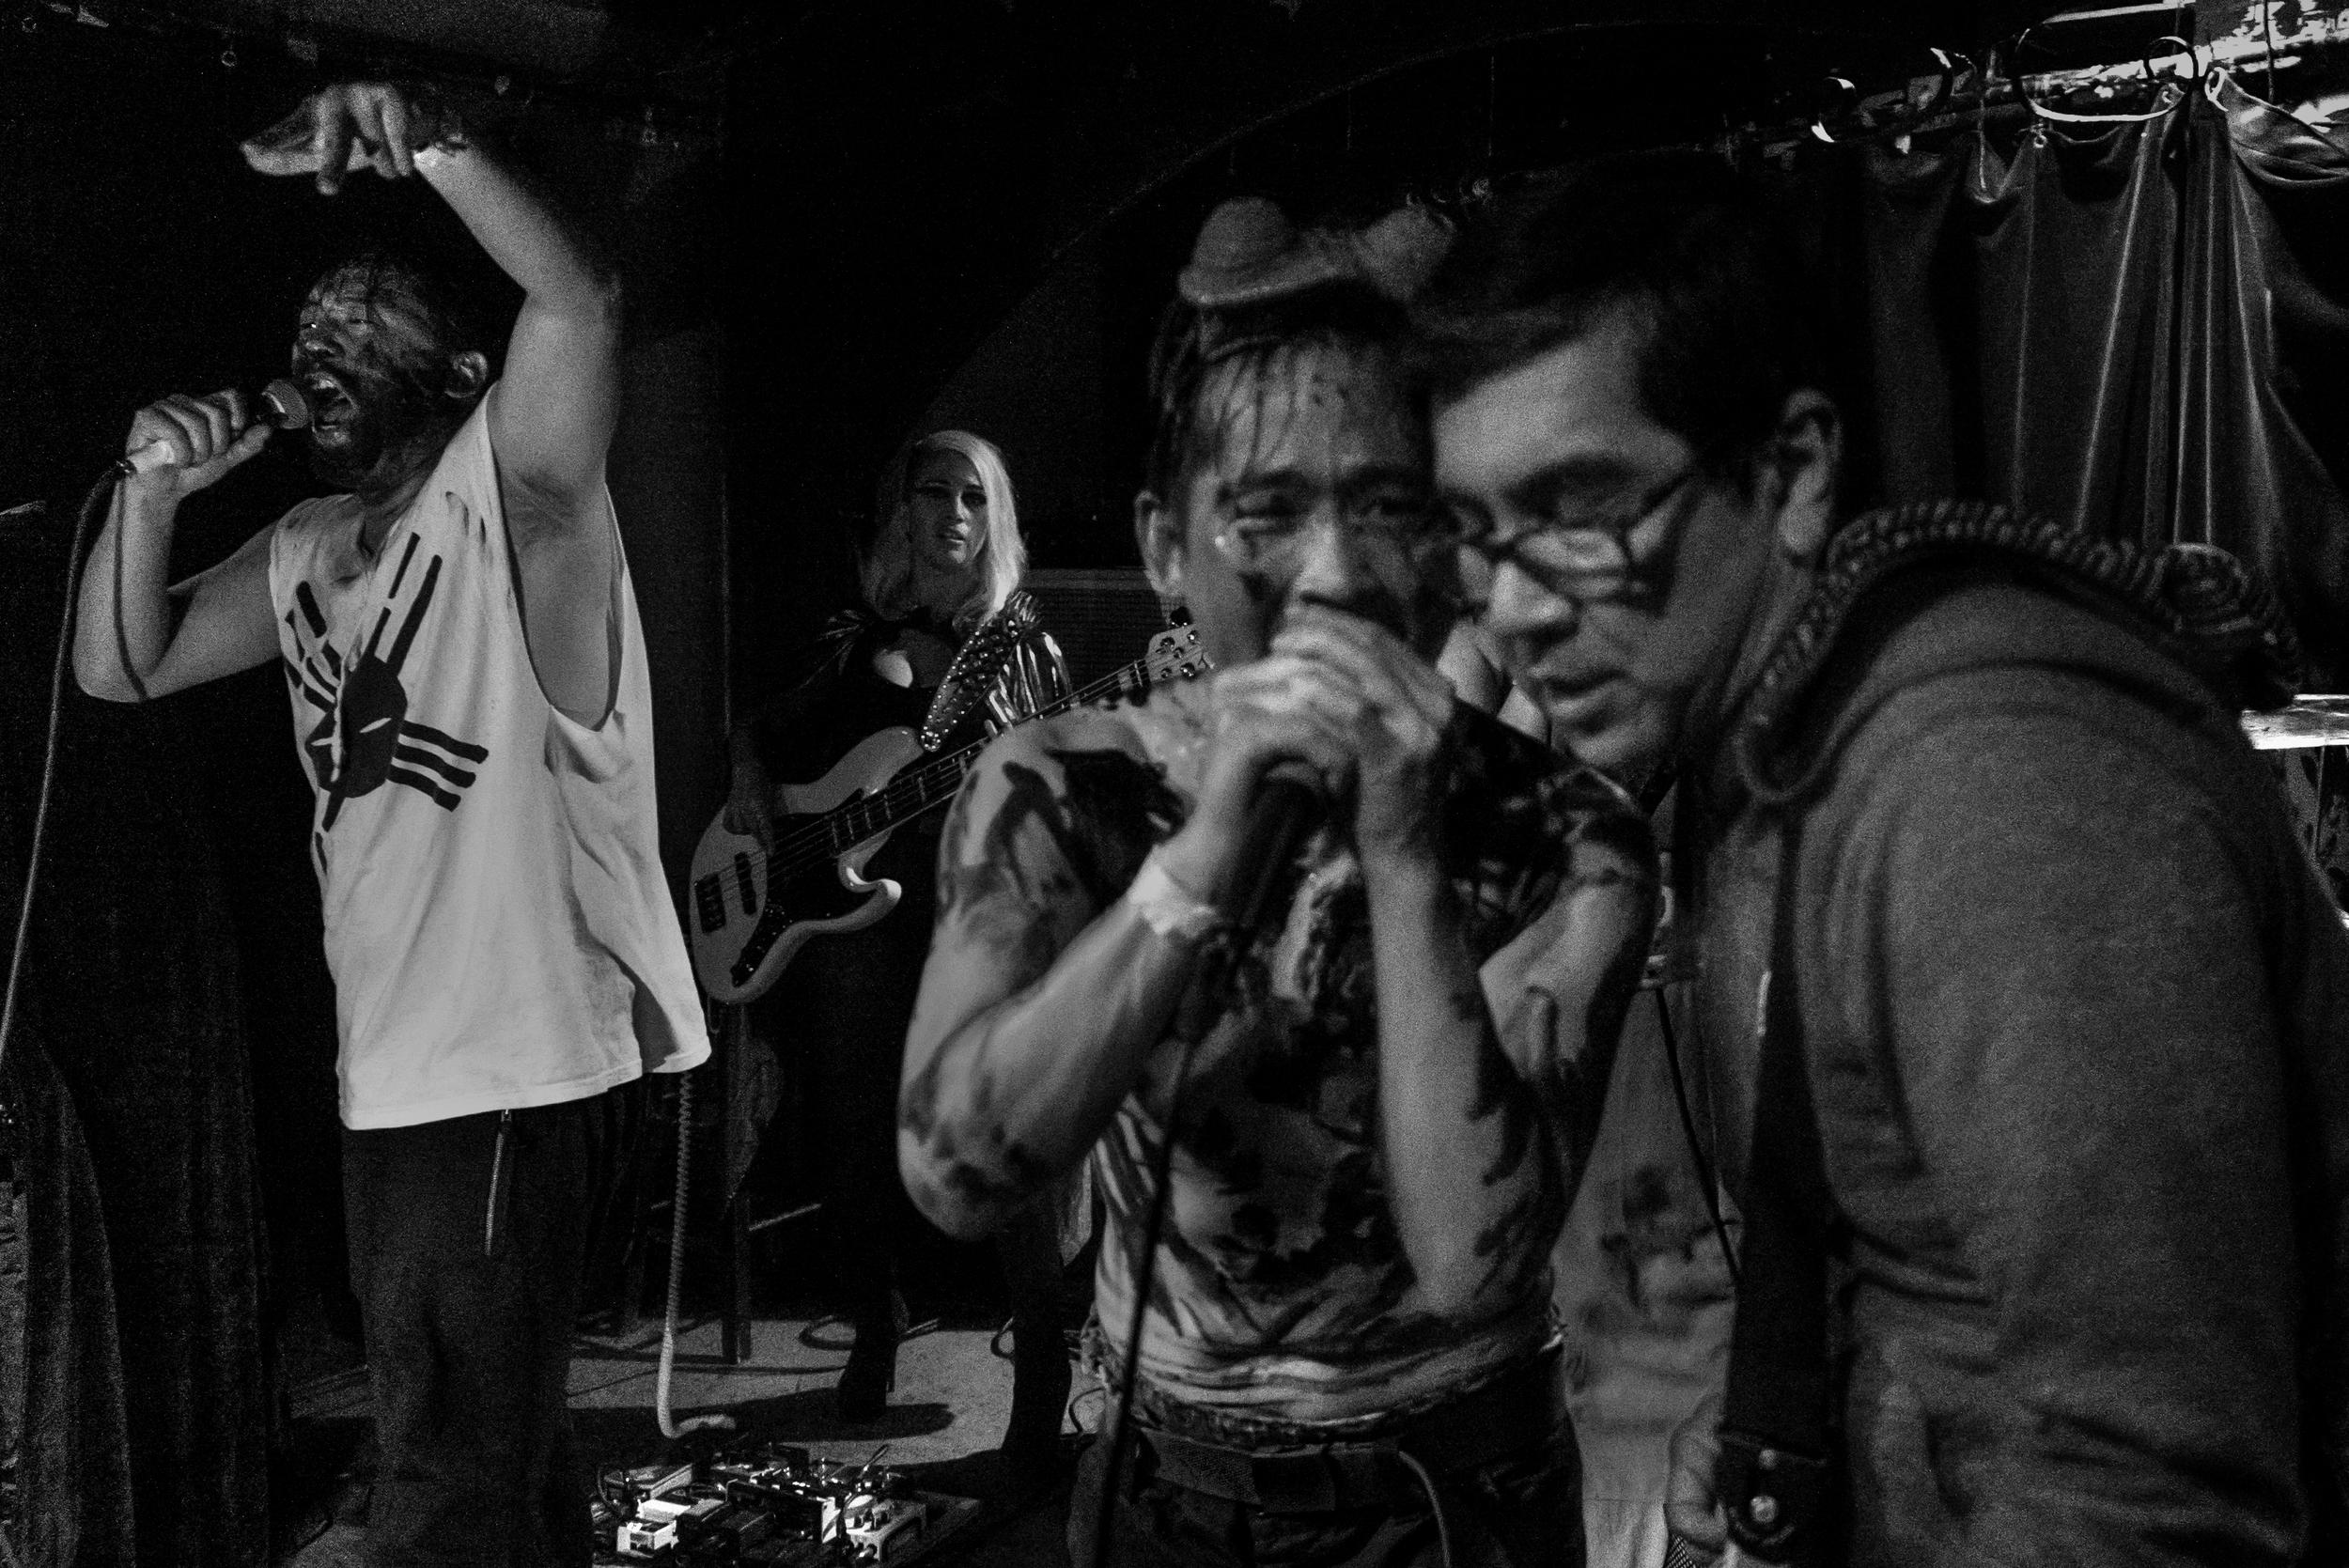 david-choe-mangchi-under-the-cobbletones-lulu-east-coast-tour-2016-tour-live-music-20.jpg